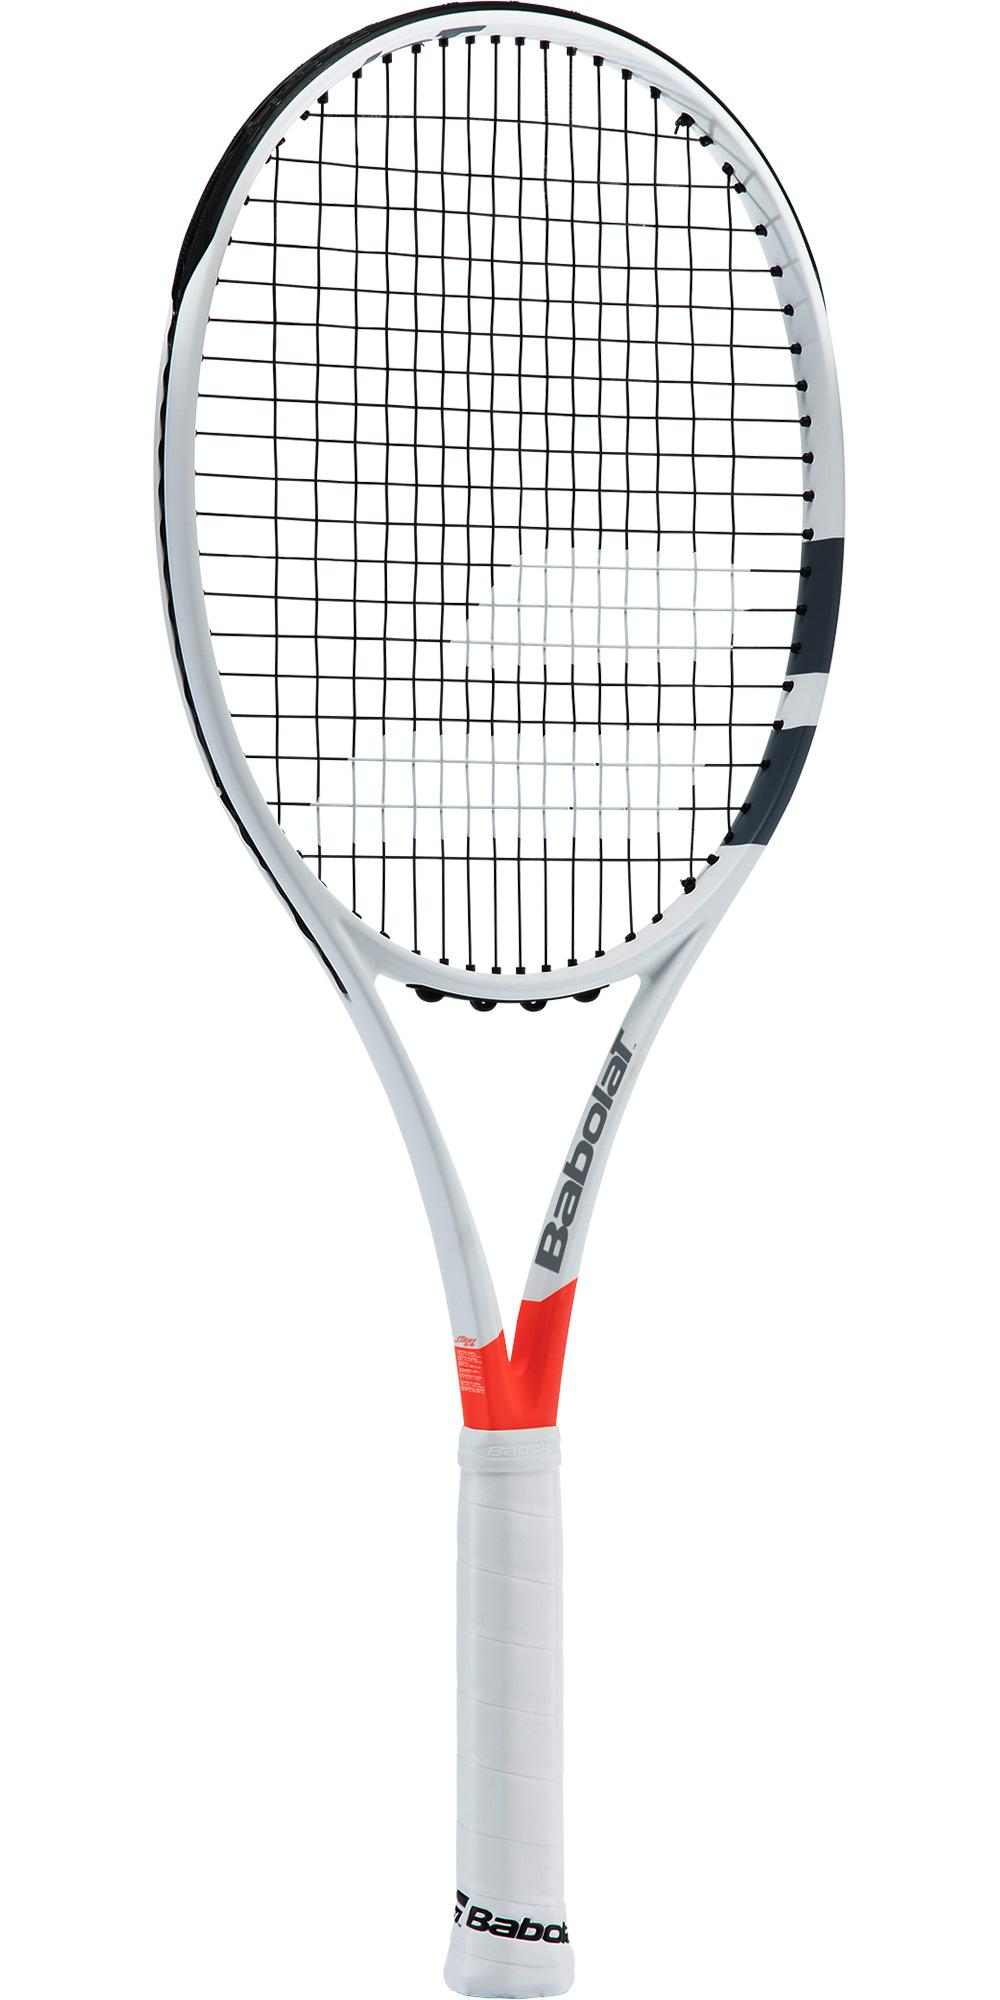 3e4355d50 Babolat Pure Strike 100 Tennis Racket - Tennisnuts.com